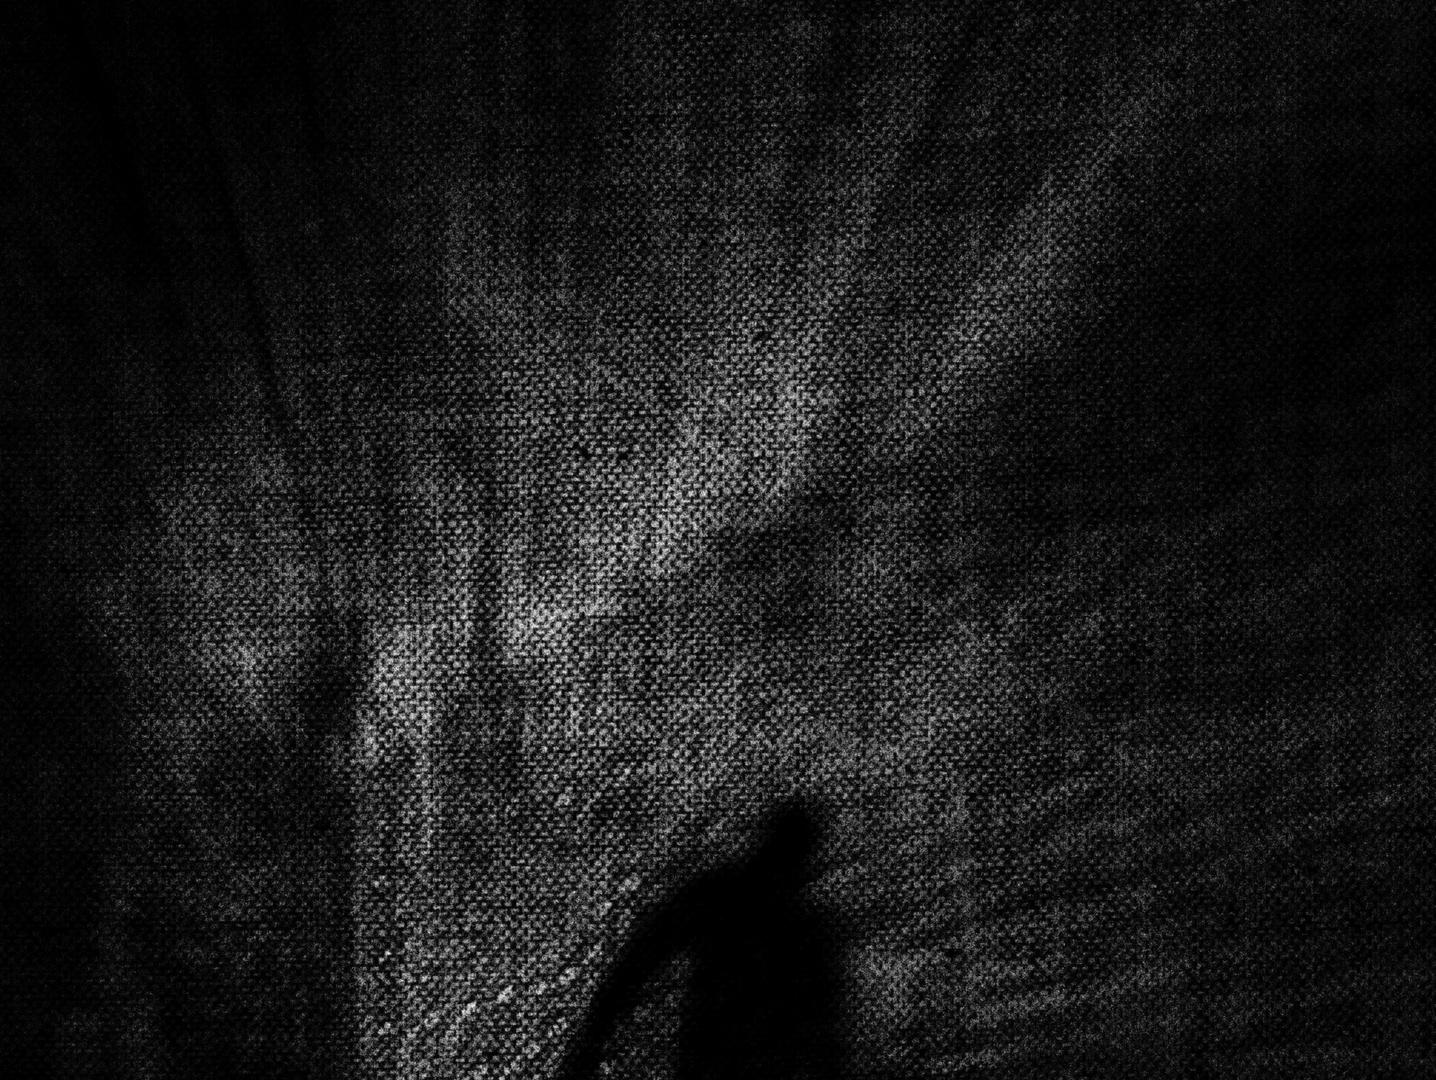 Die Welt hinter dem Vorhang